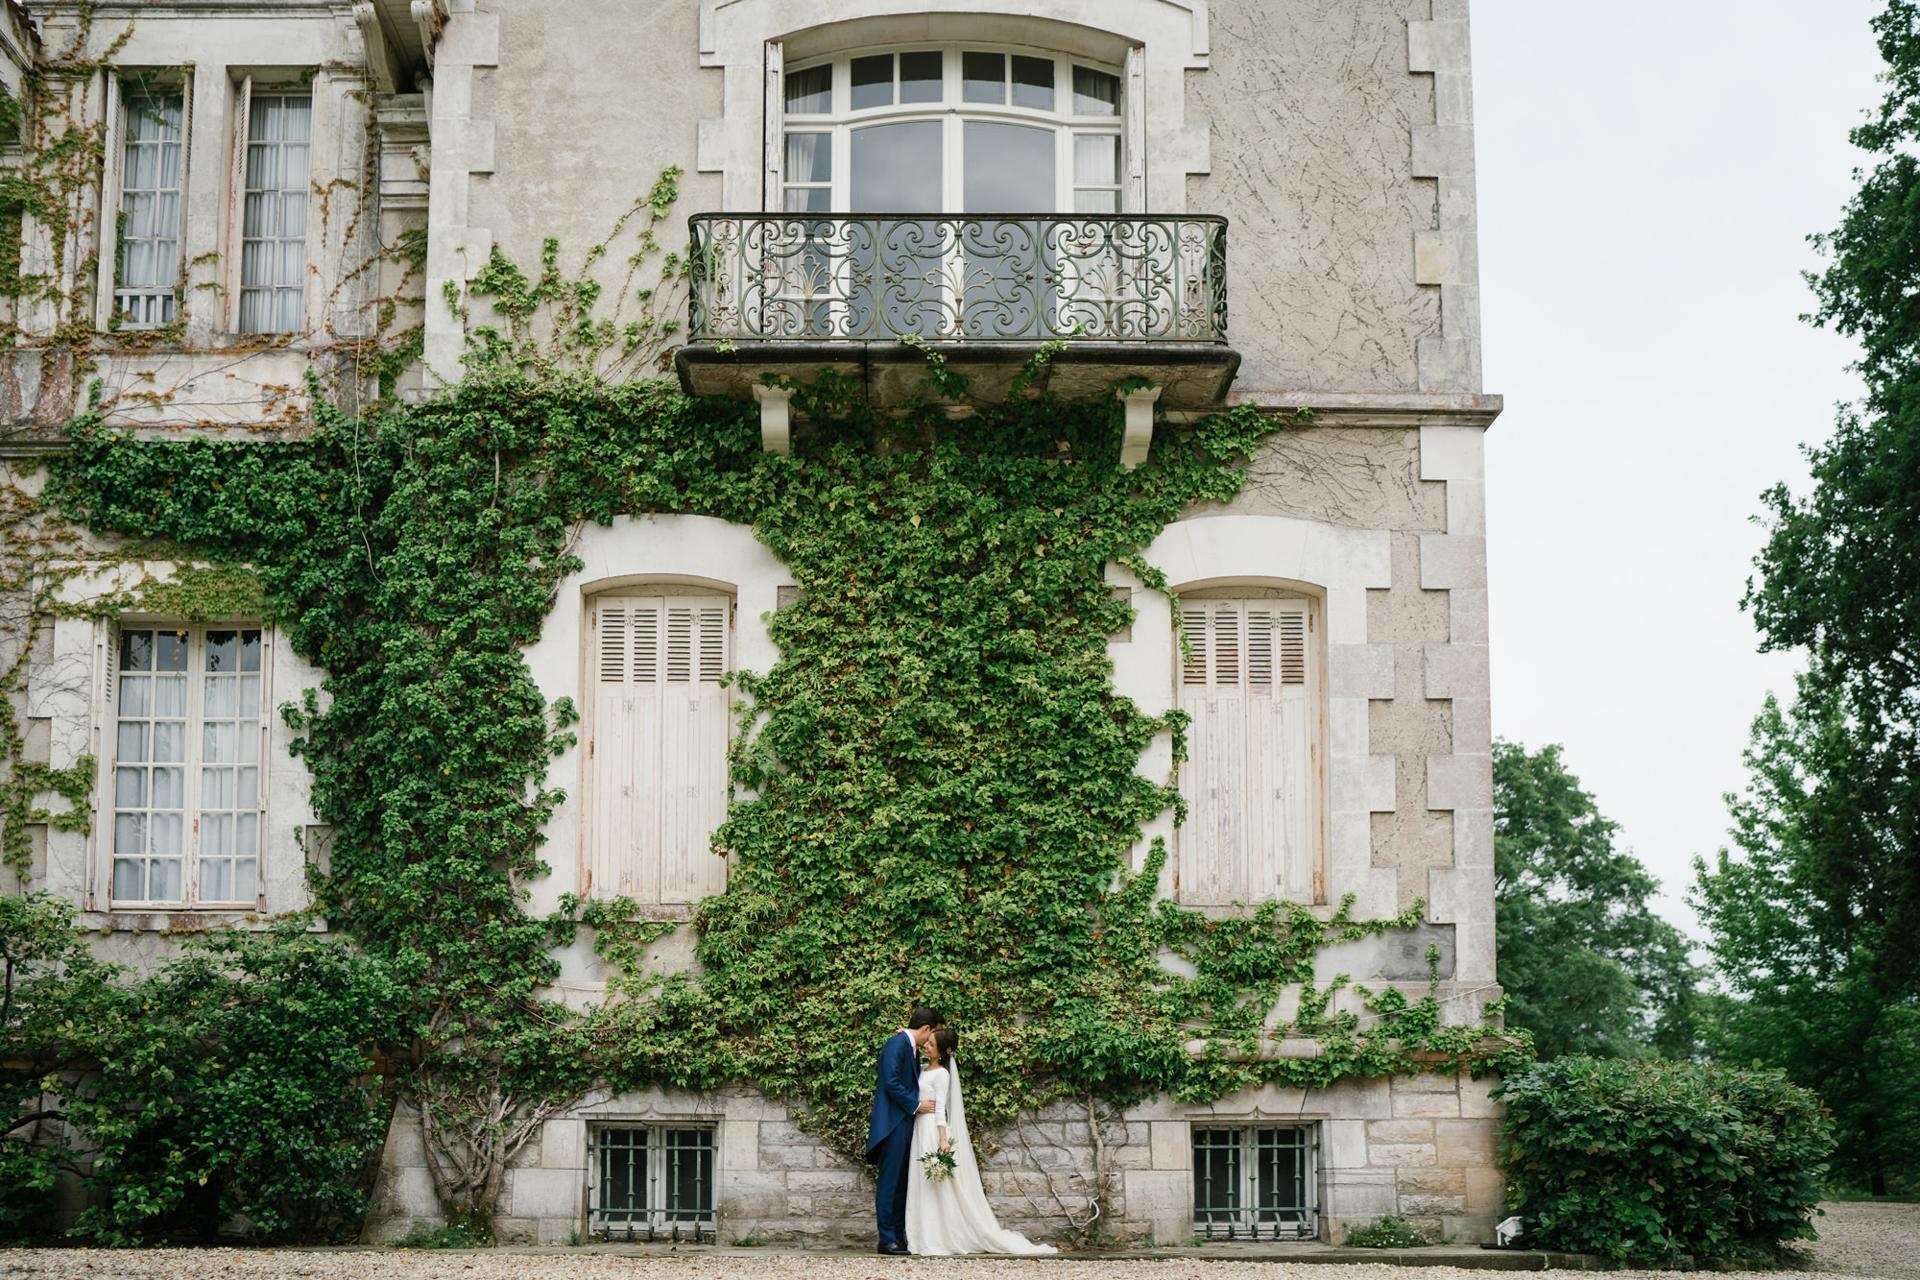 Wedding & Event Planner - Destination Wedding en San Sebastián - Boda Beatriz y Gonzalo 04